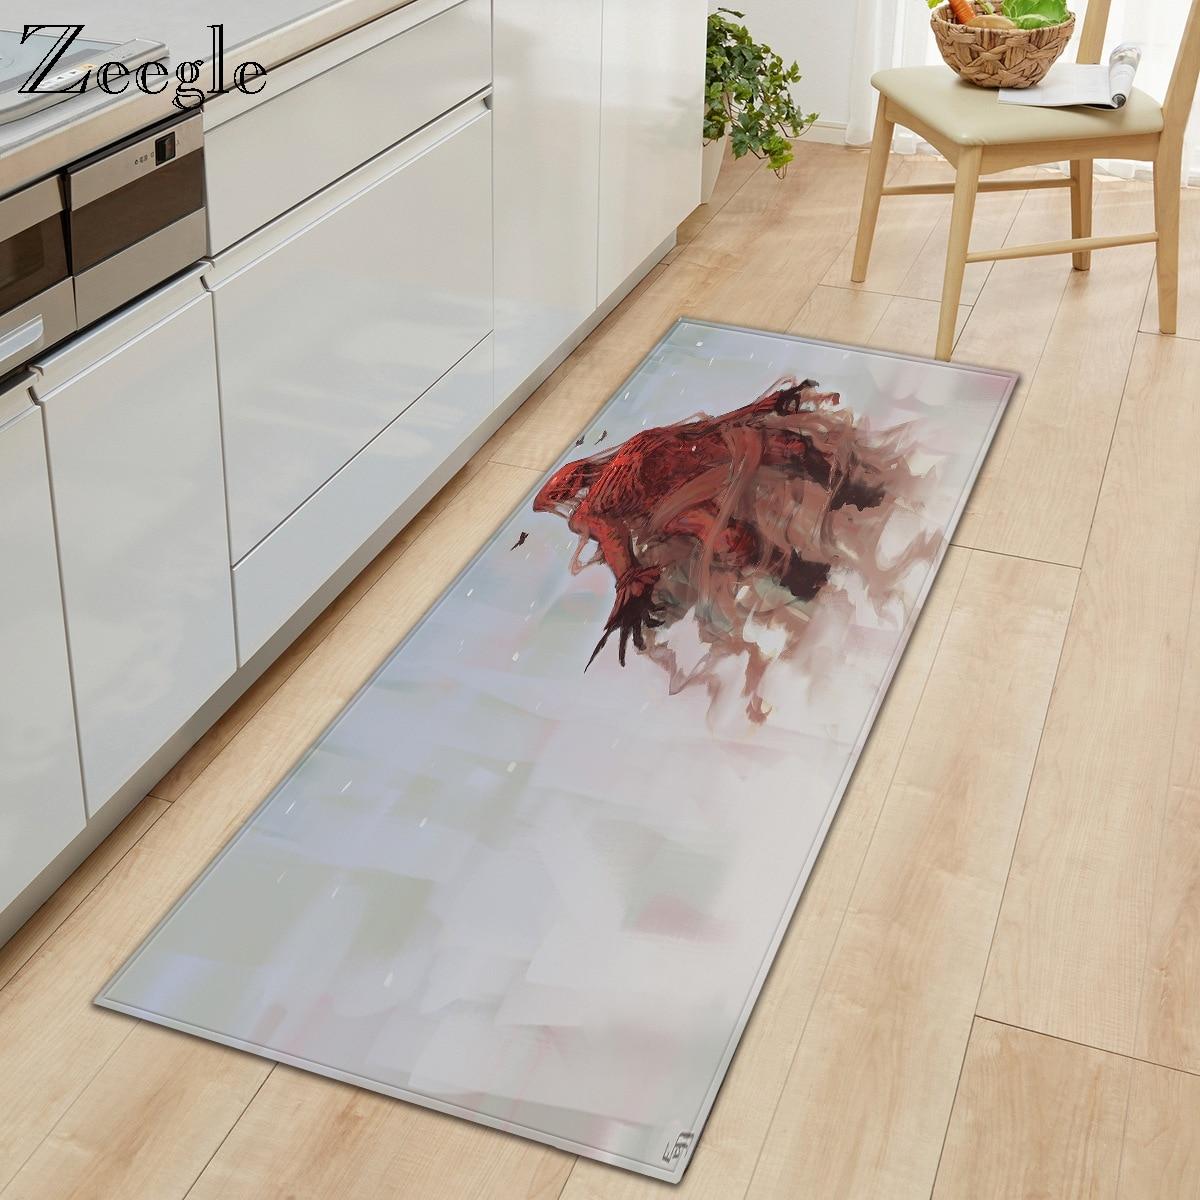 Zeegle Cartoon Carpet for Living Room Decoration Non-Slip Kitchen Rug Hallway Carpet Flannel Bathroom Doormat Bedside Carpet Mat